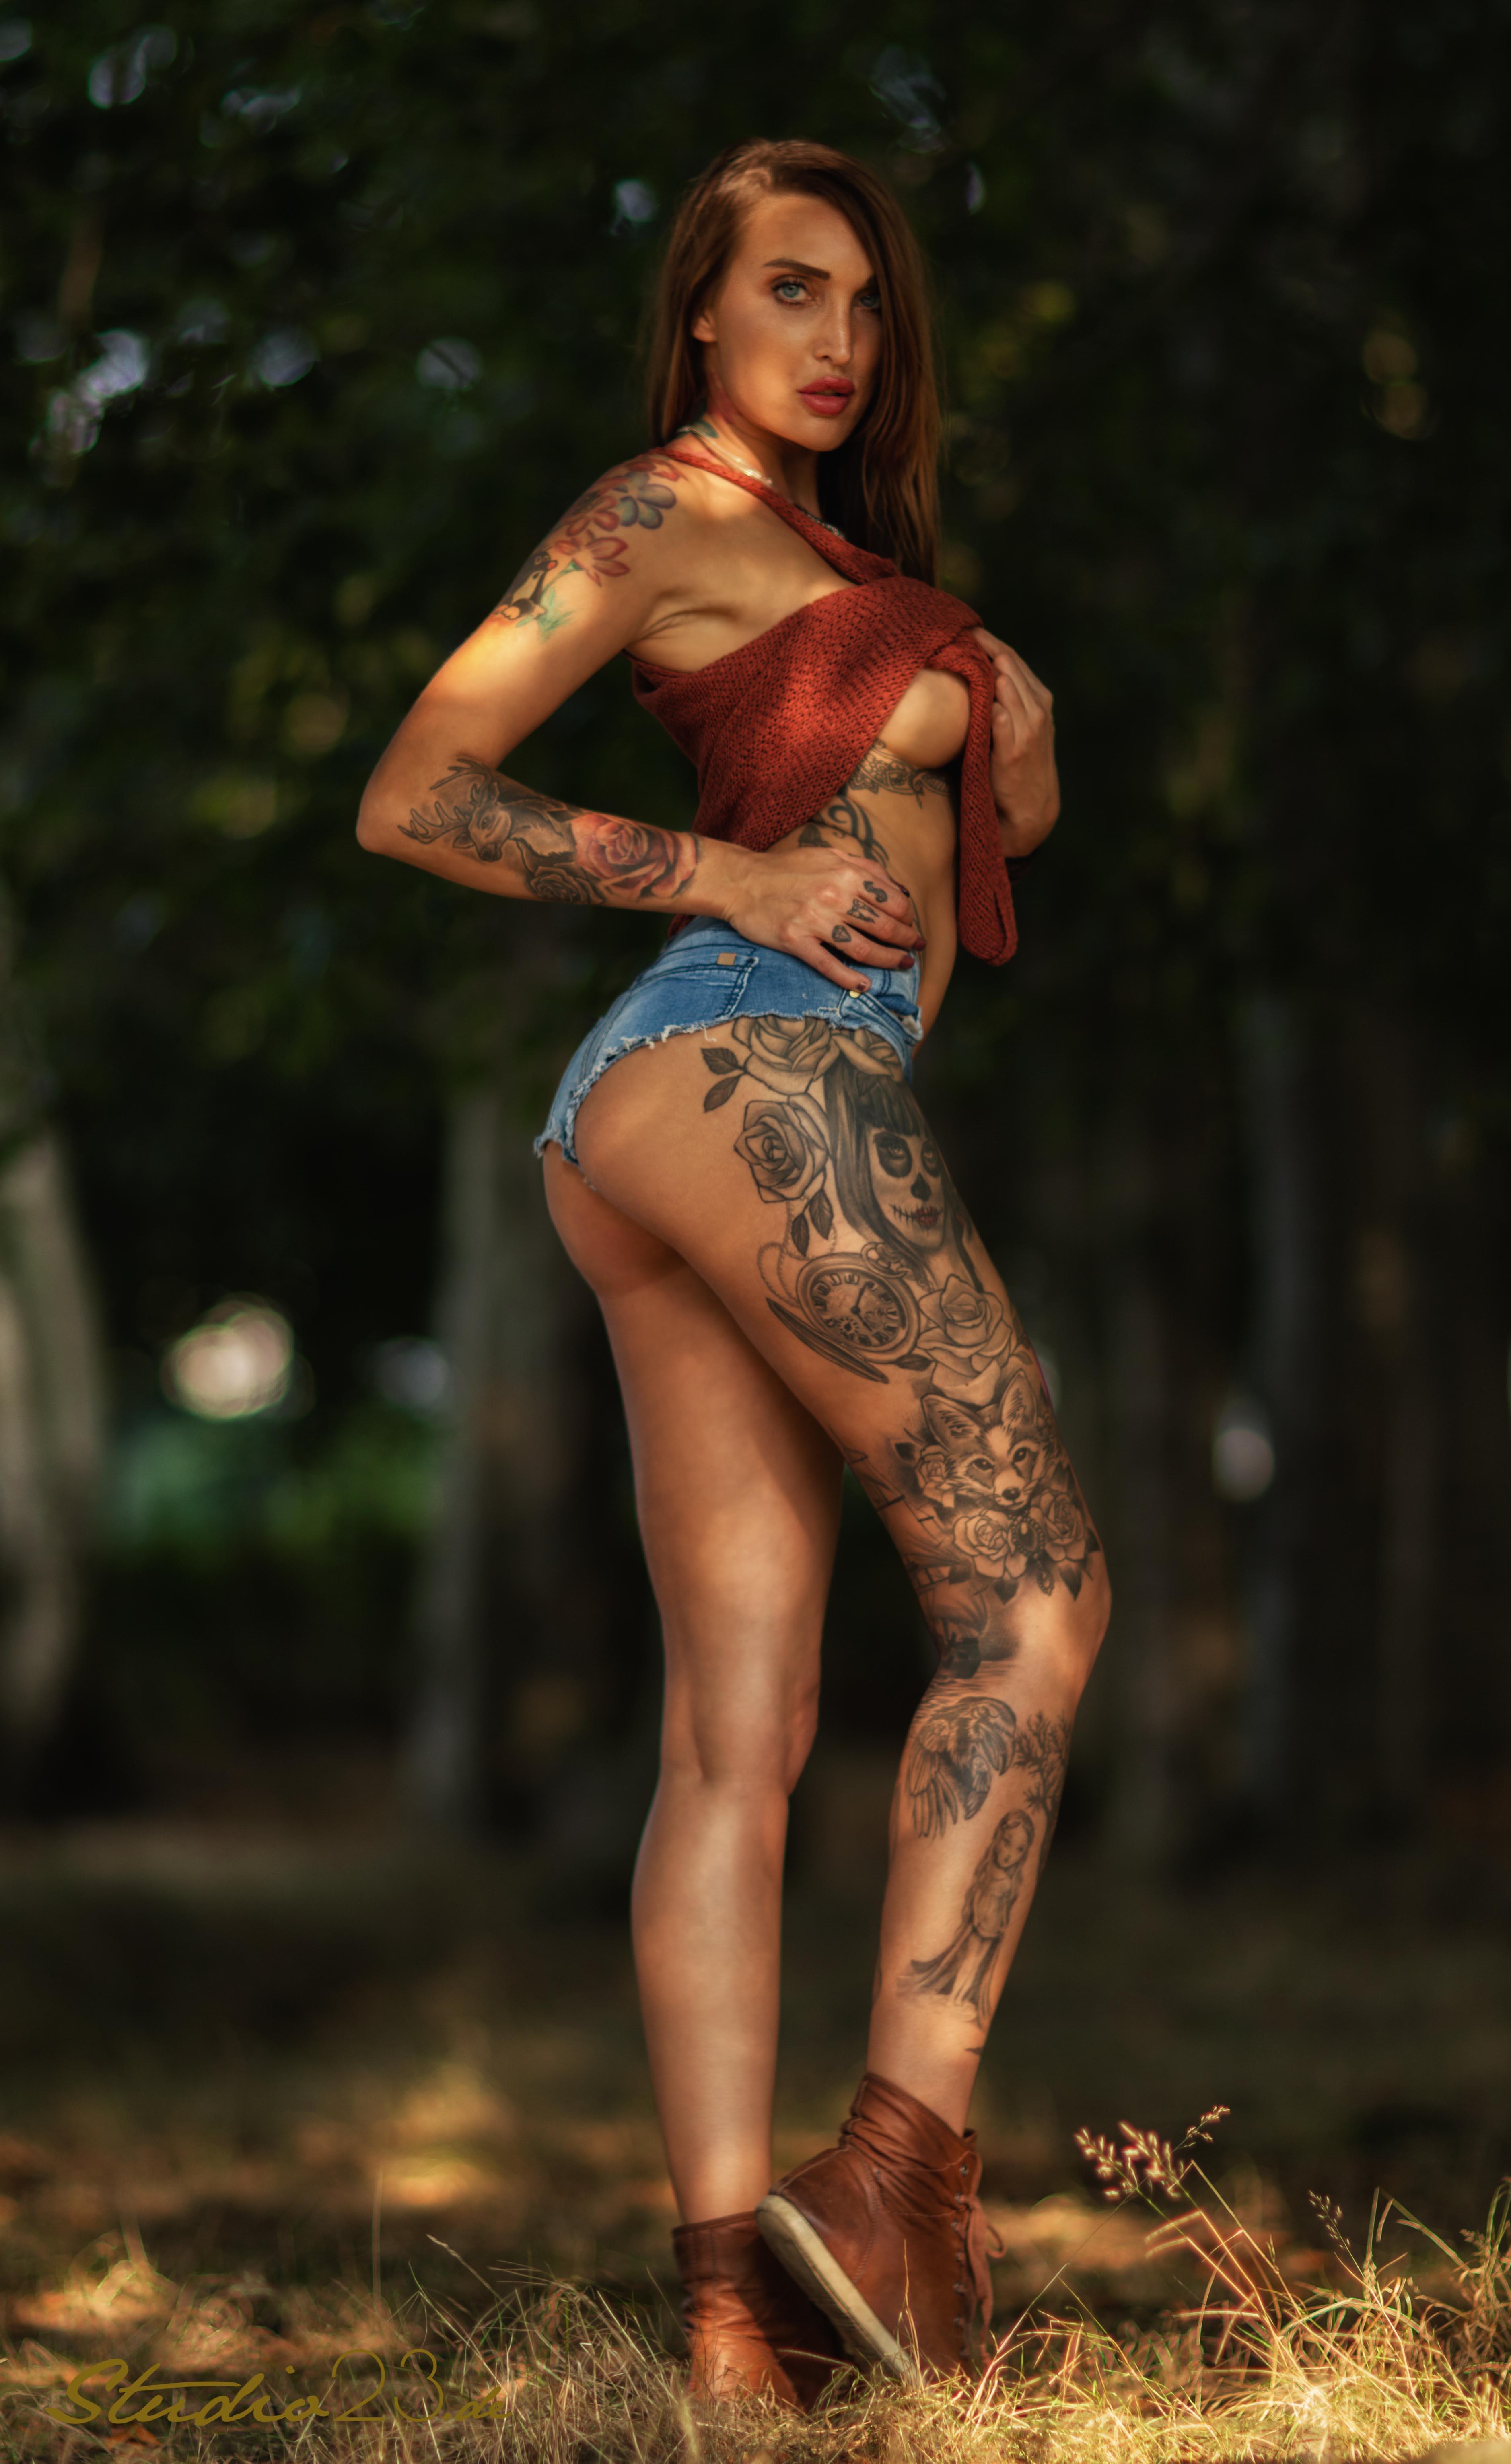 Juliana Raudies